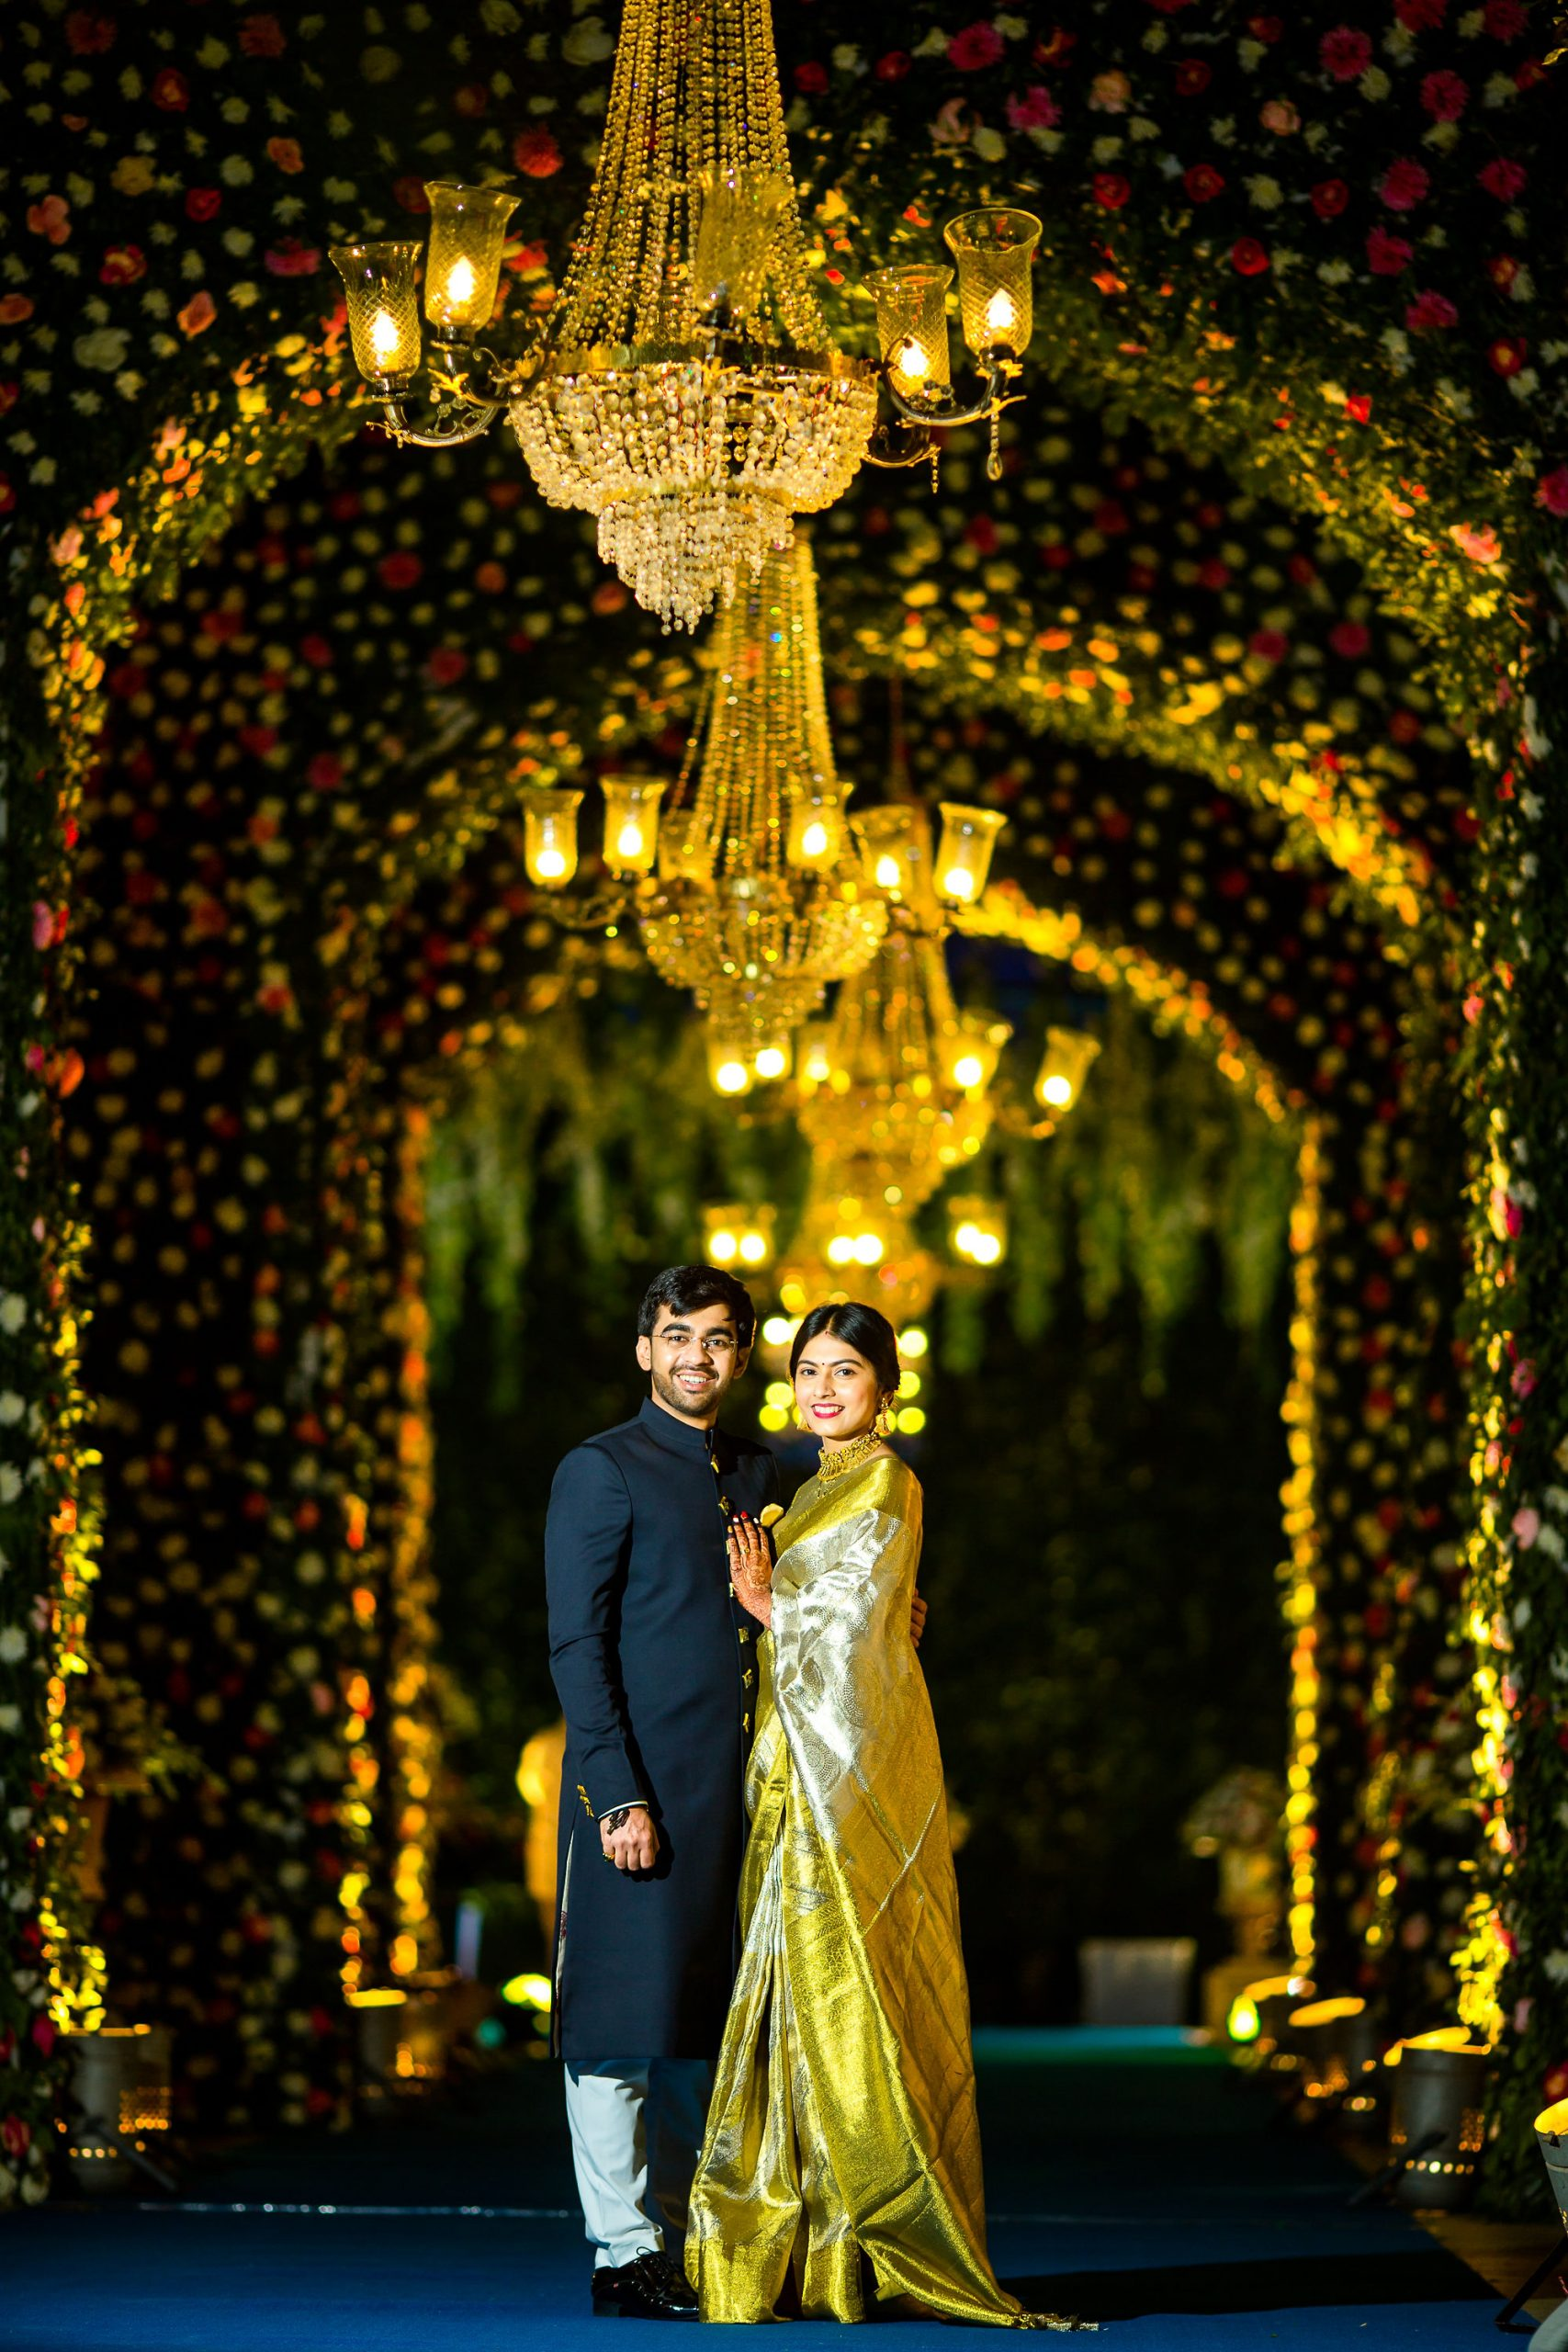 Wedding Reception Decor & outfit Ideas for royal wedding